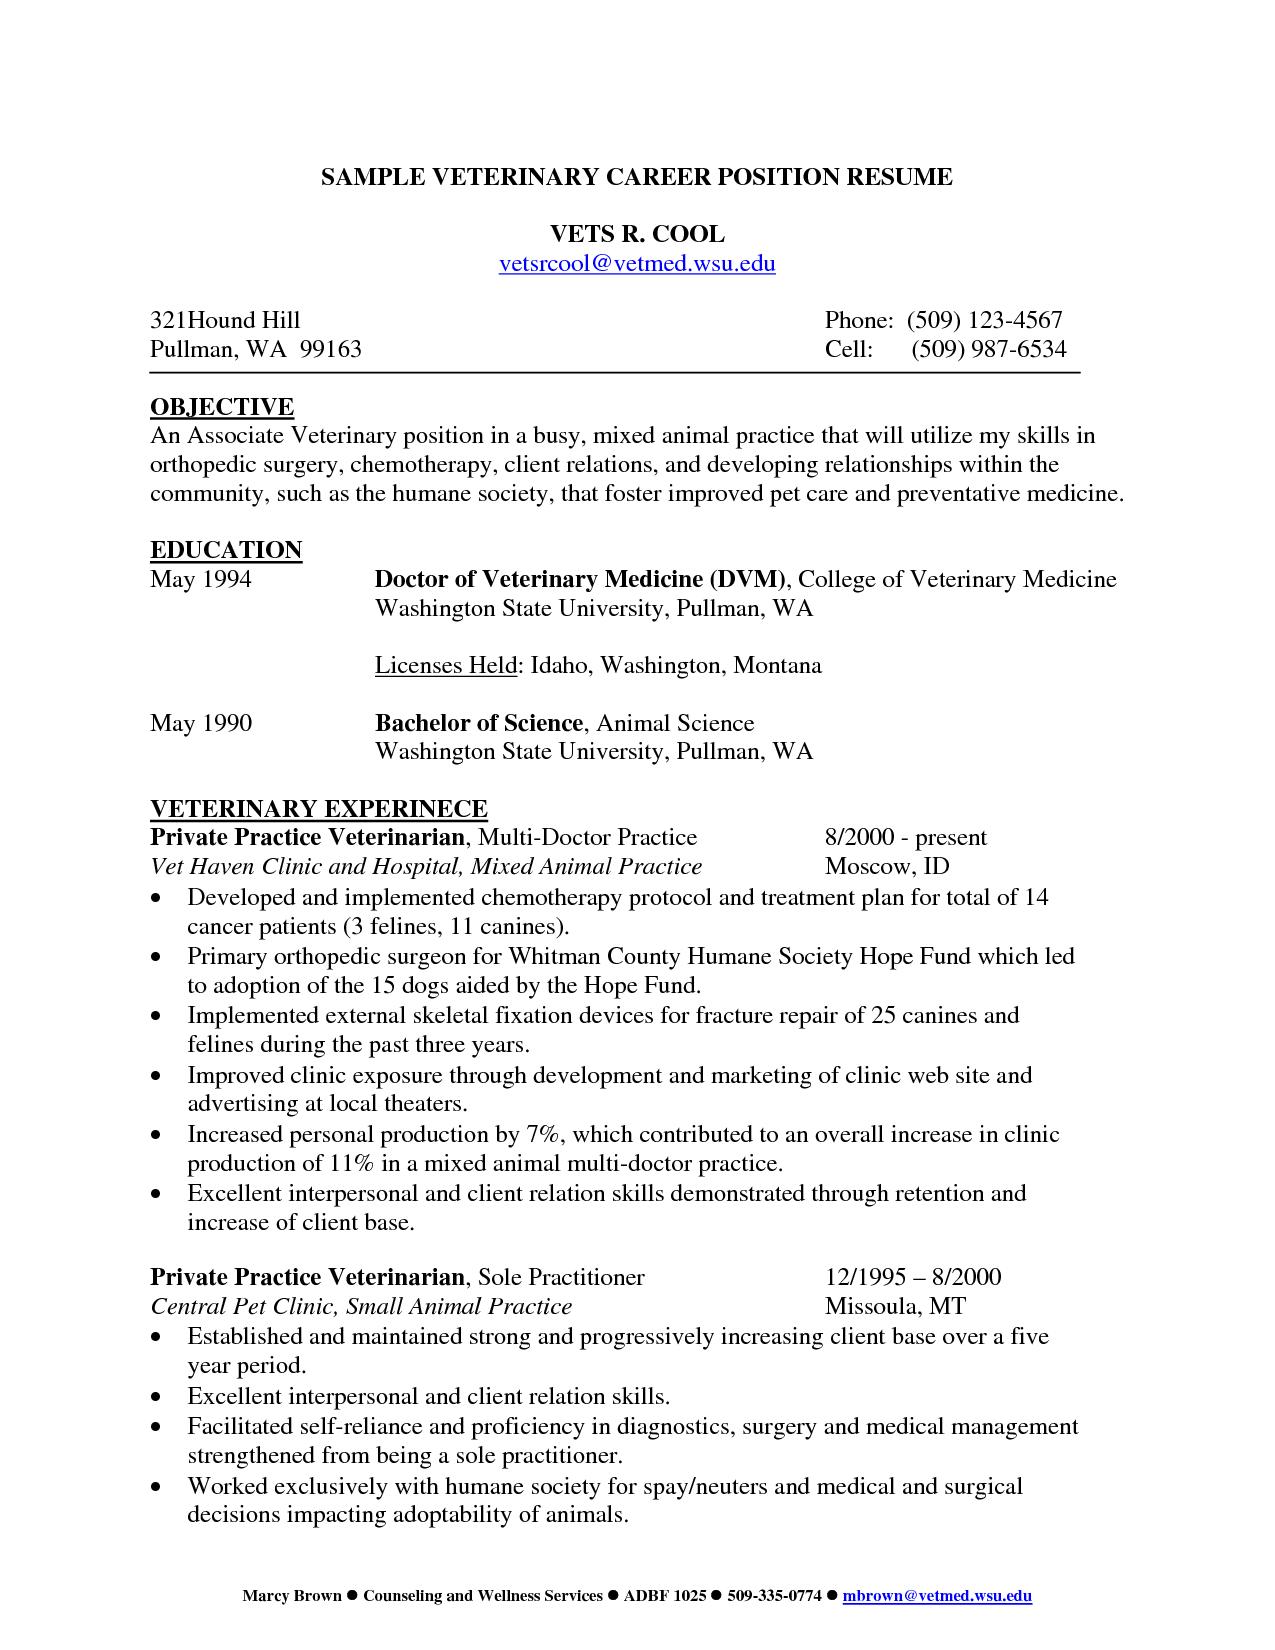 Veterinary Resume Best Resume Format Veterinary Doctor  Pinterest  Resume Format And .